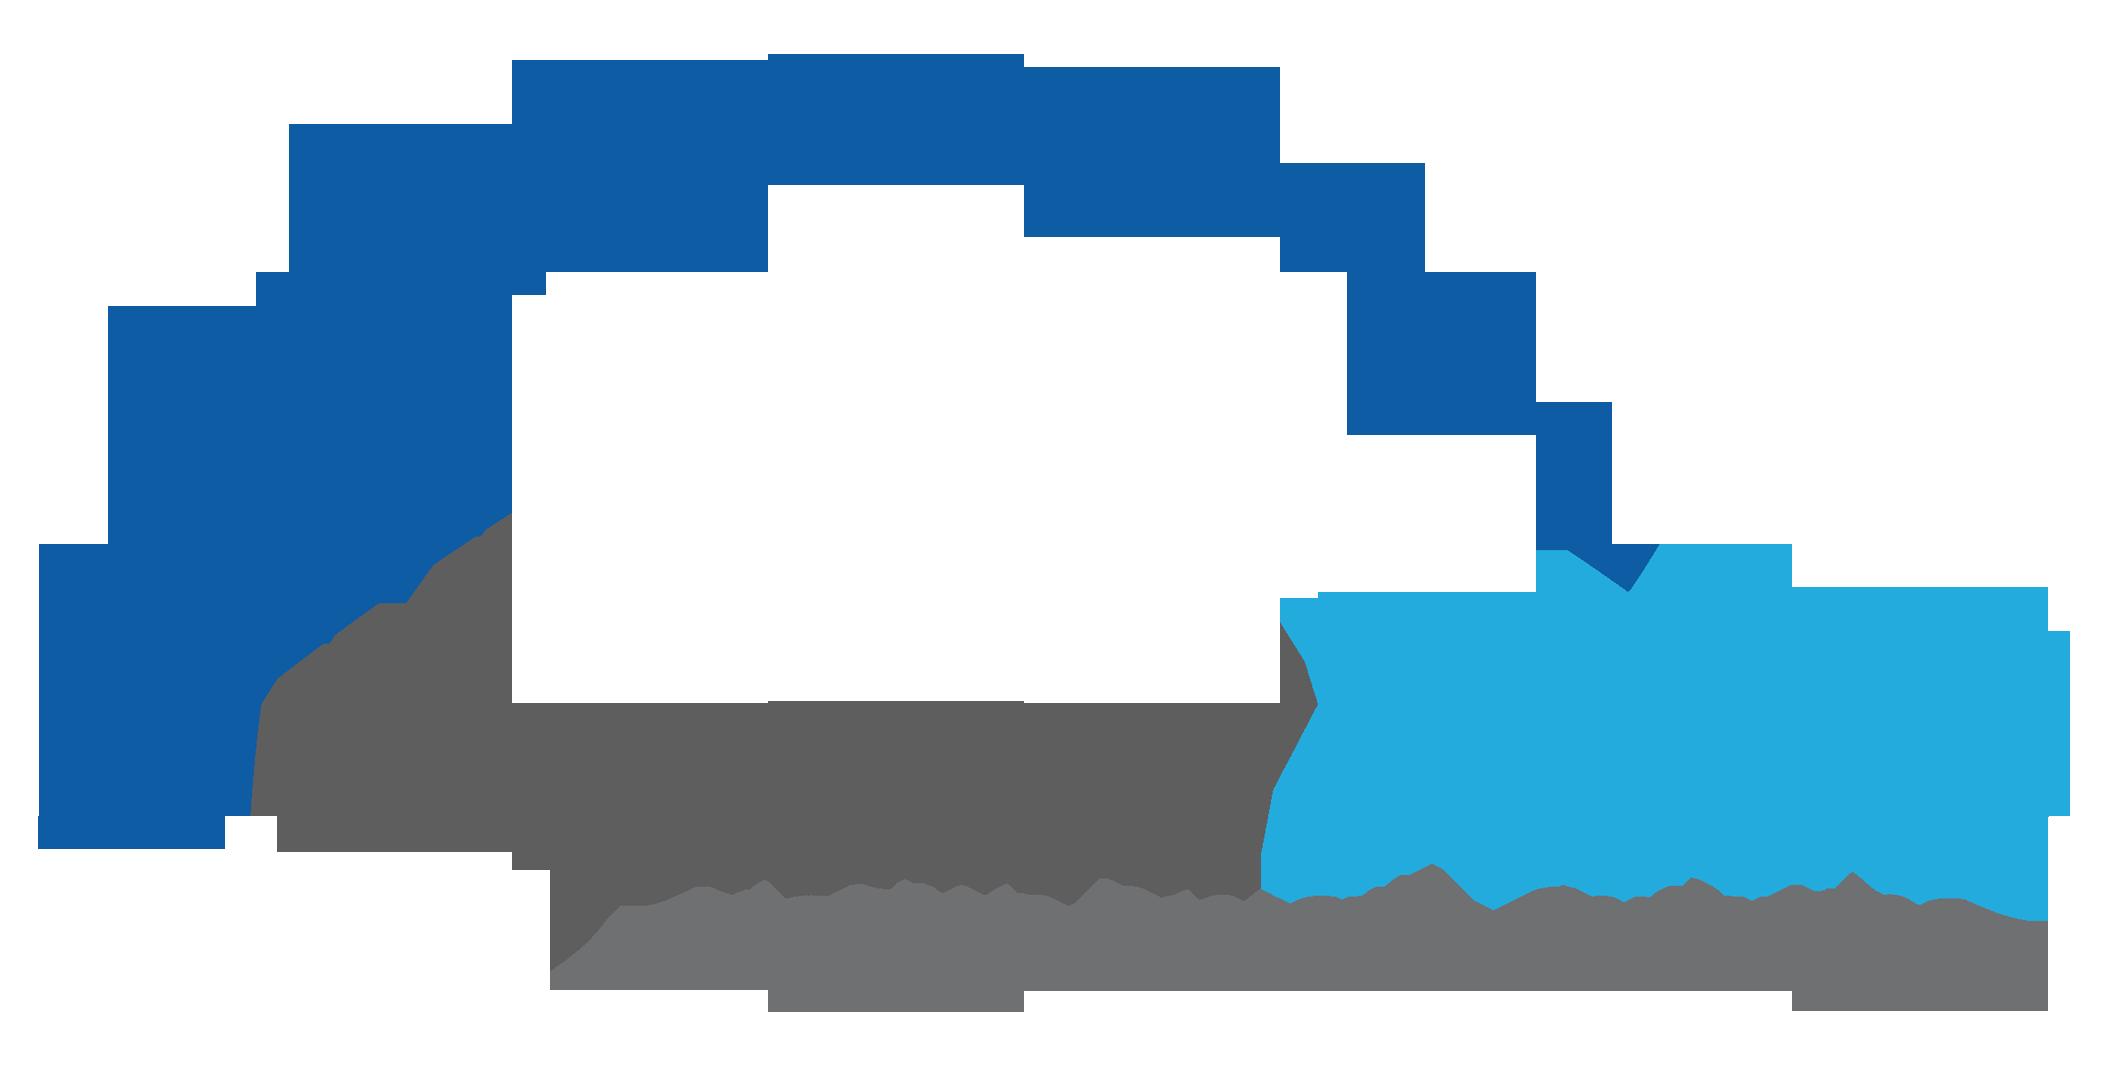 IndustryARC